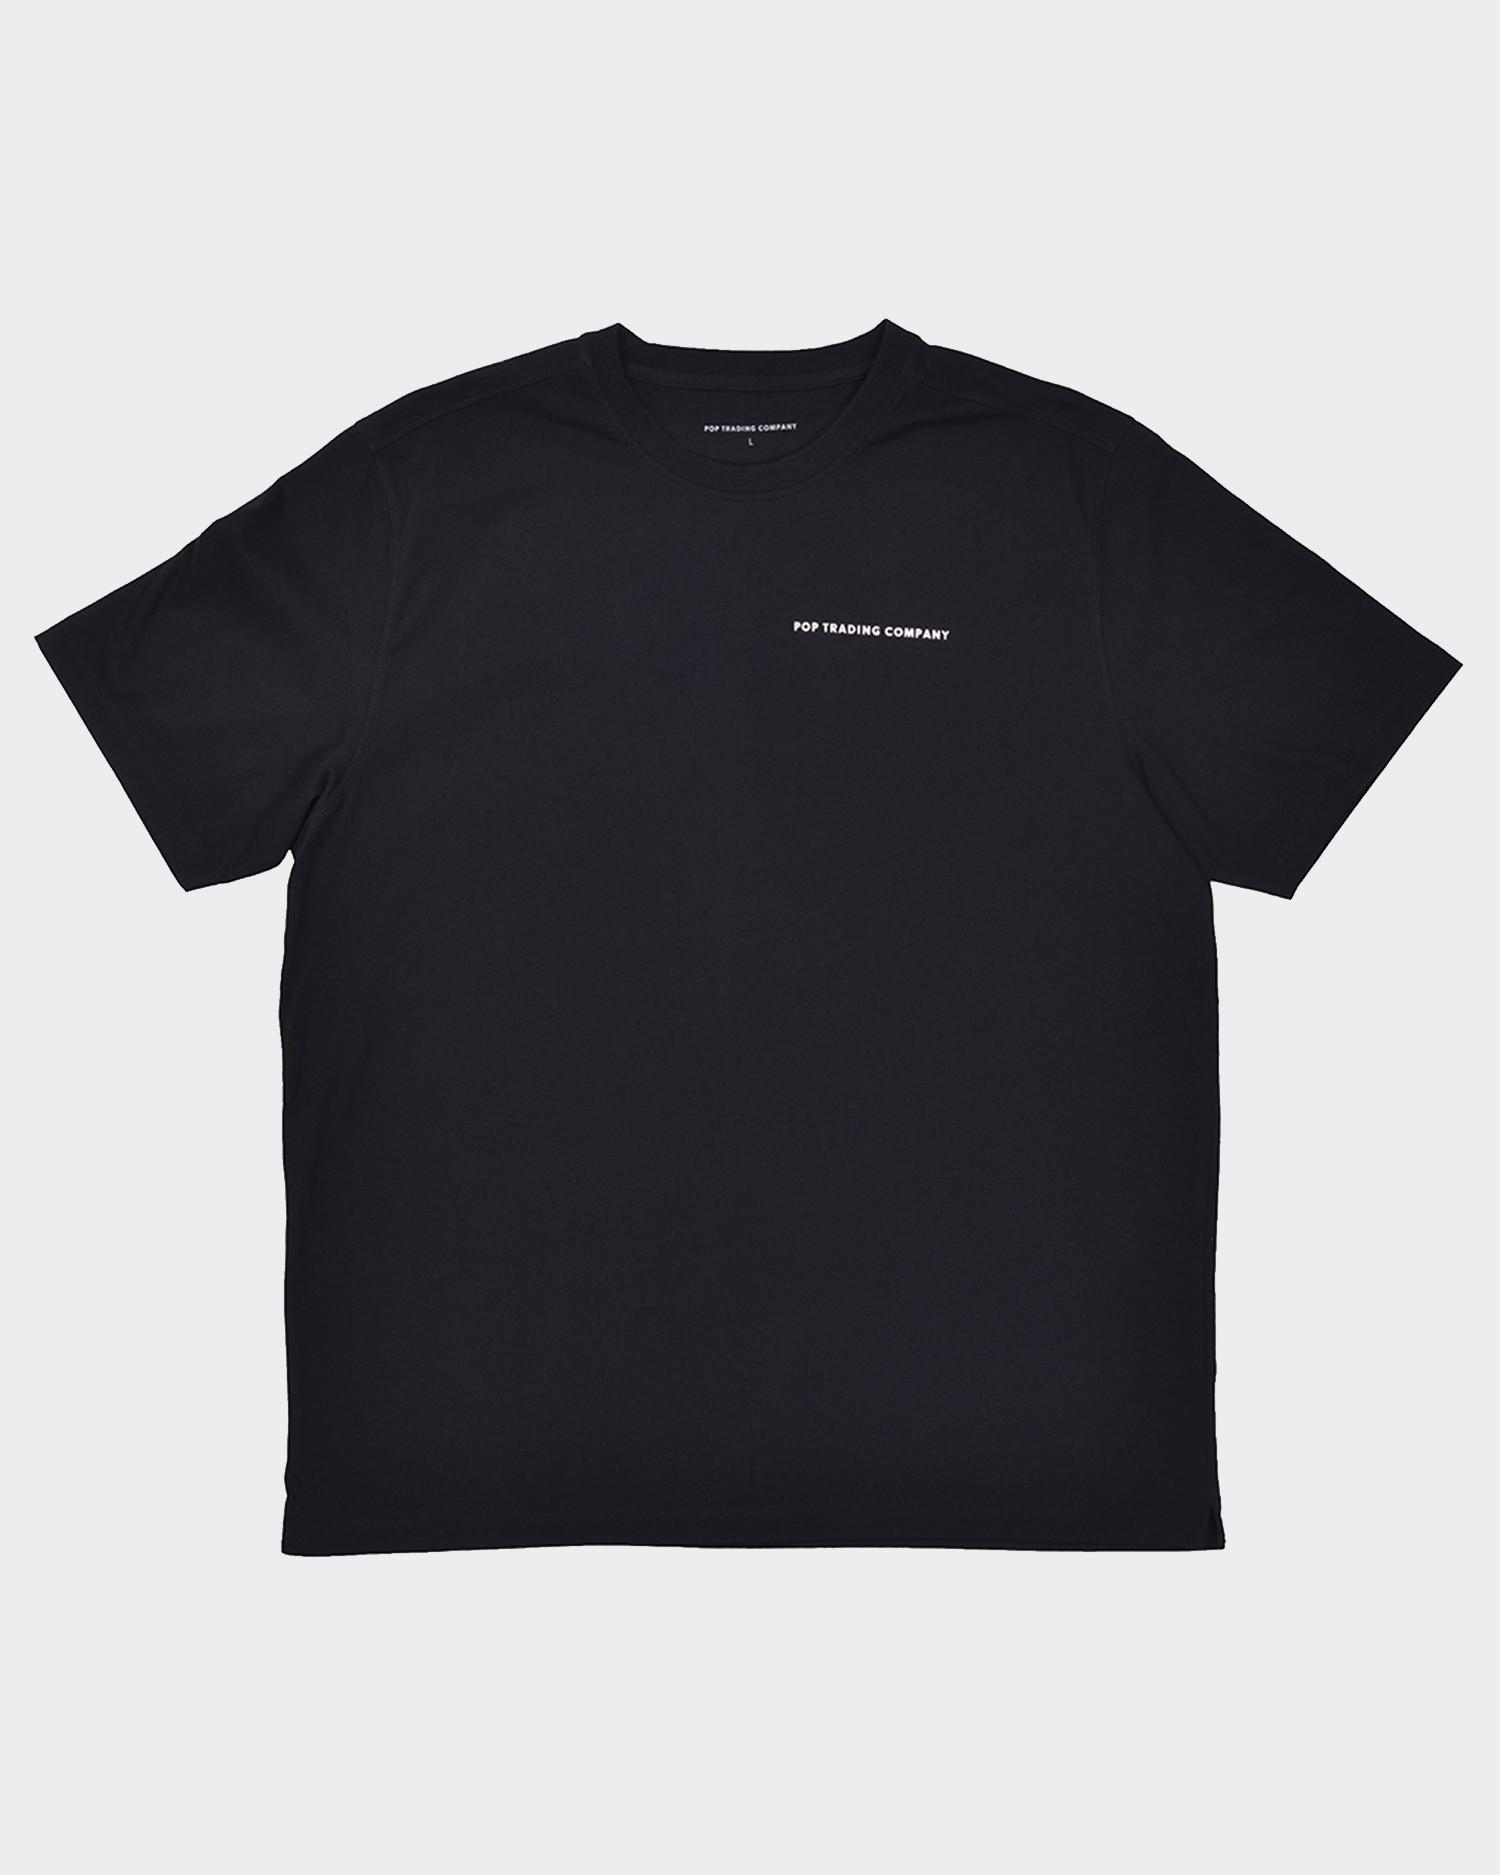 Pop Trading Company Logo T-shirt Black/White